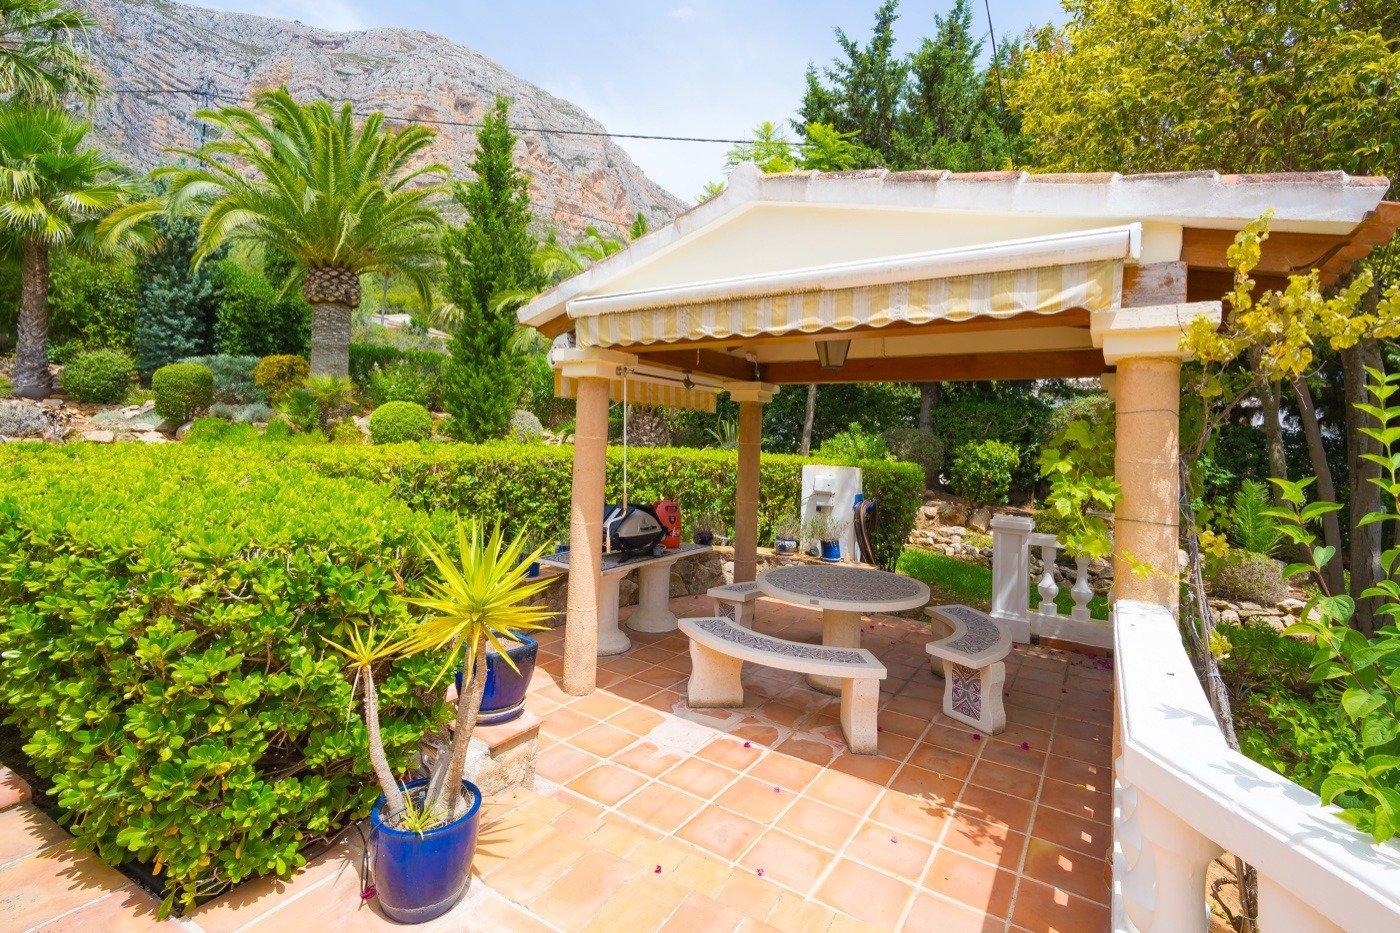 Vente. Villa à Javea/Xabia